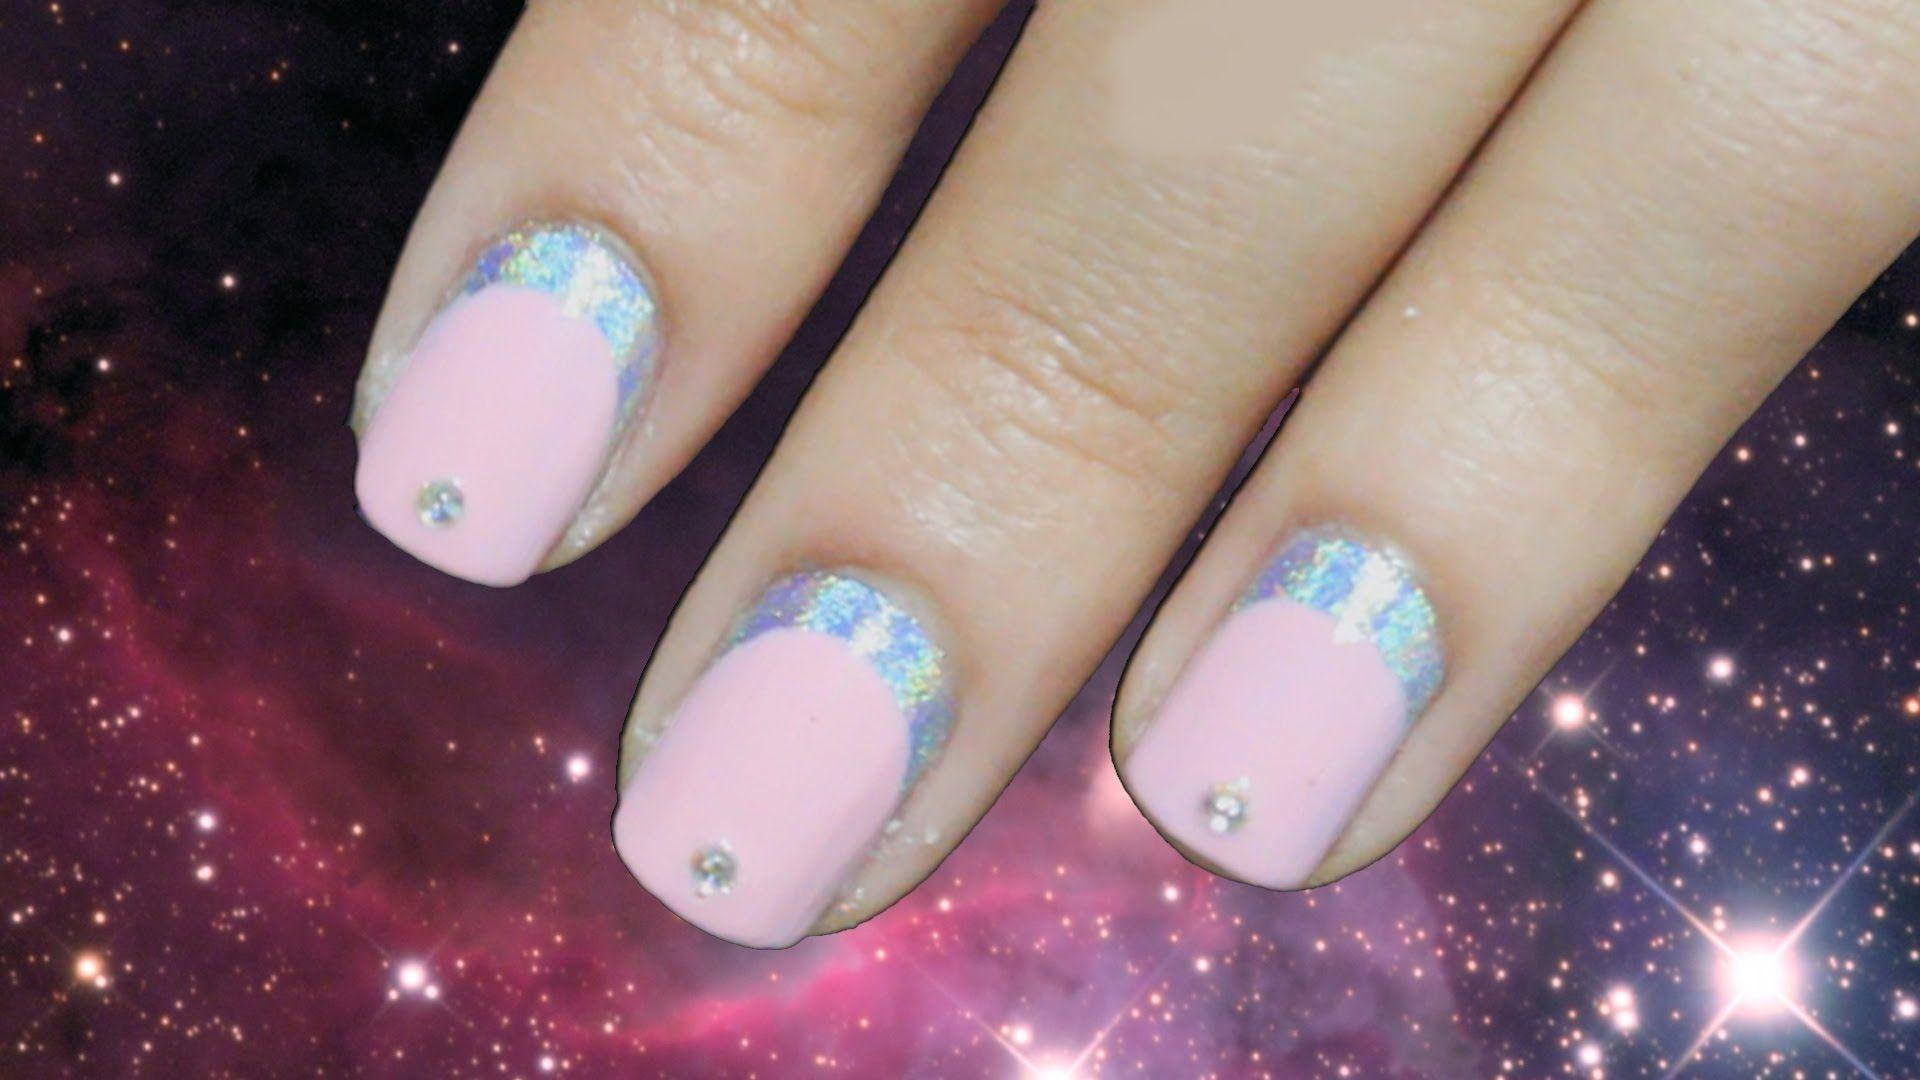 Hologram Eclipse Nails | French/Elegant/Classy Nails | Pinterest ...